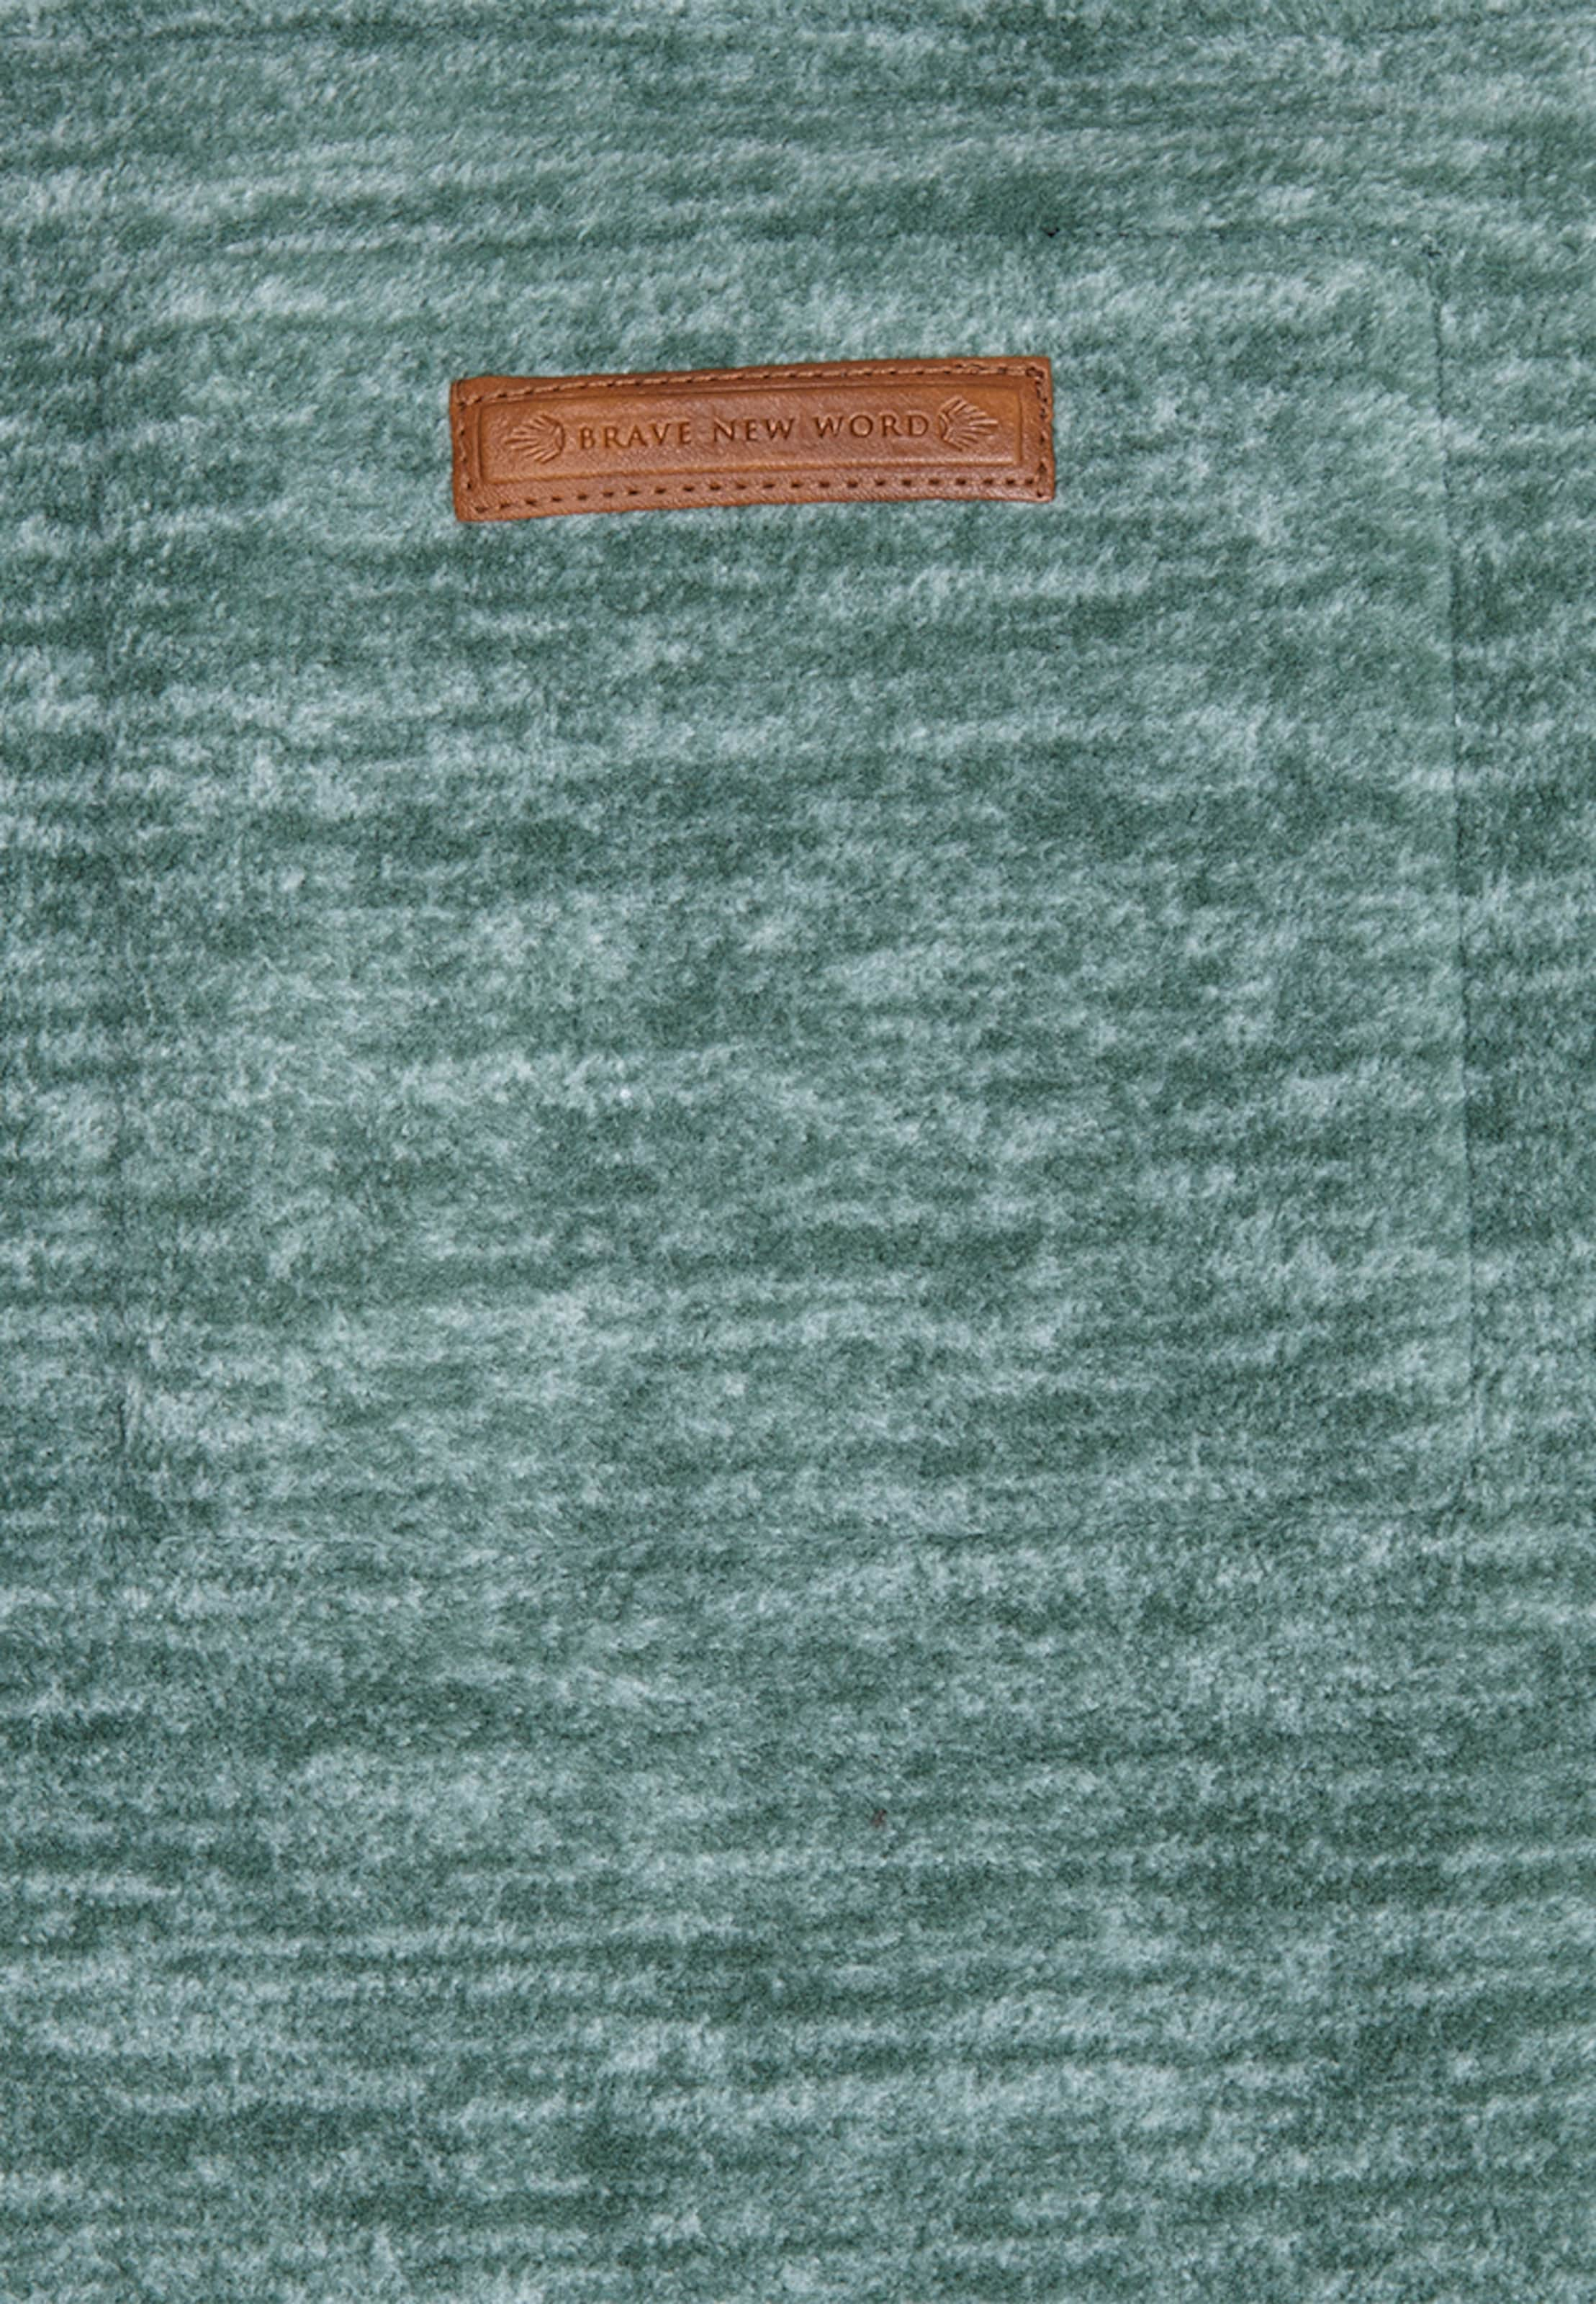 Billig Verkaufen Low-Cost naketano Zipped Jacket 'Gnadenlos durchgerattert II' Wiki SAK6W